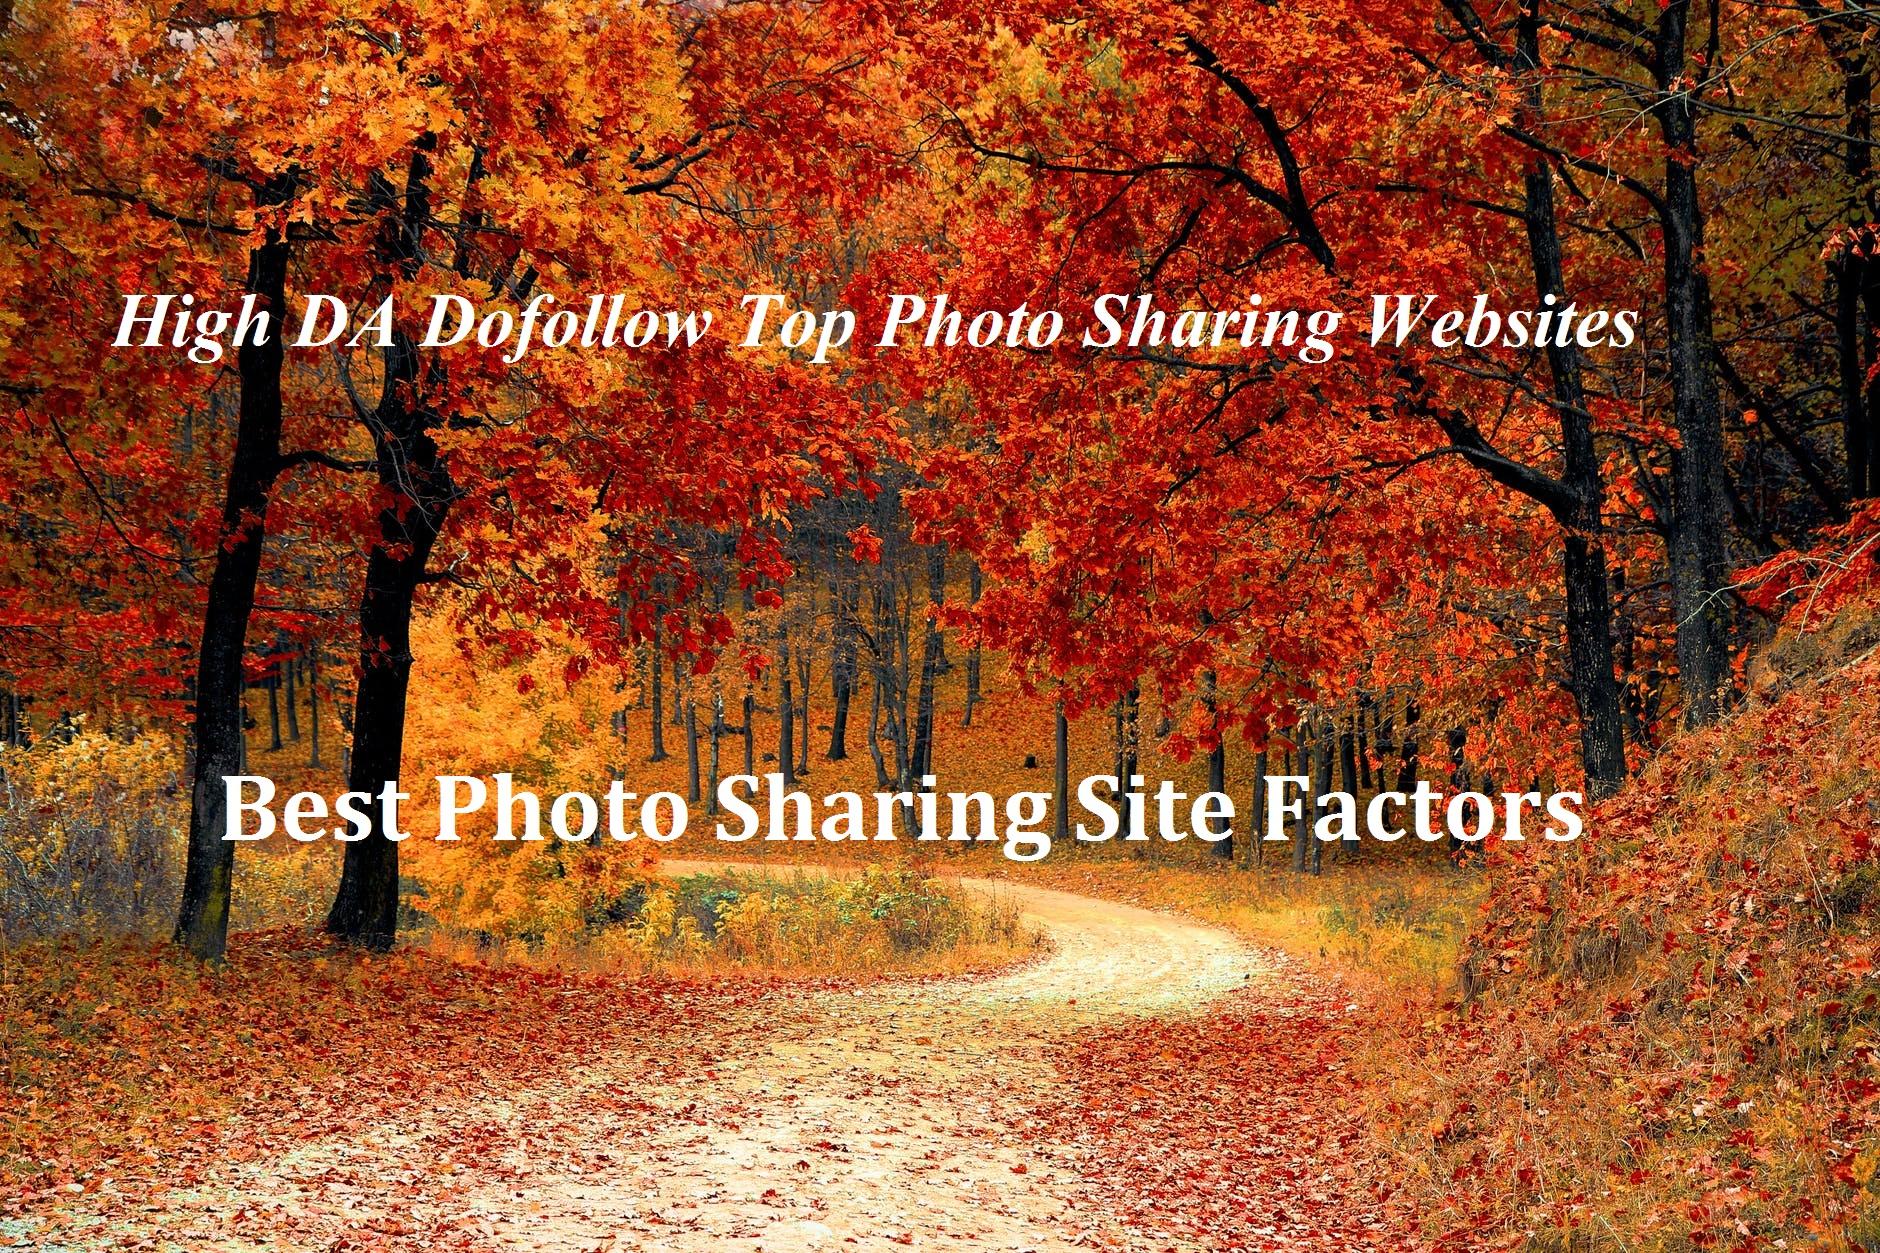 Top Photo Sharing Websites